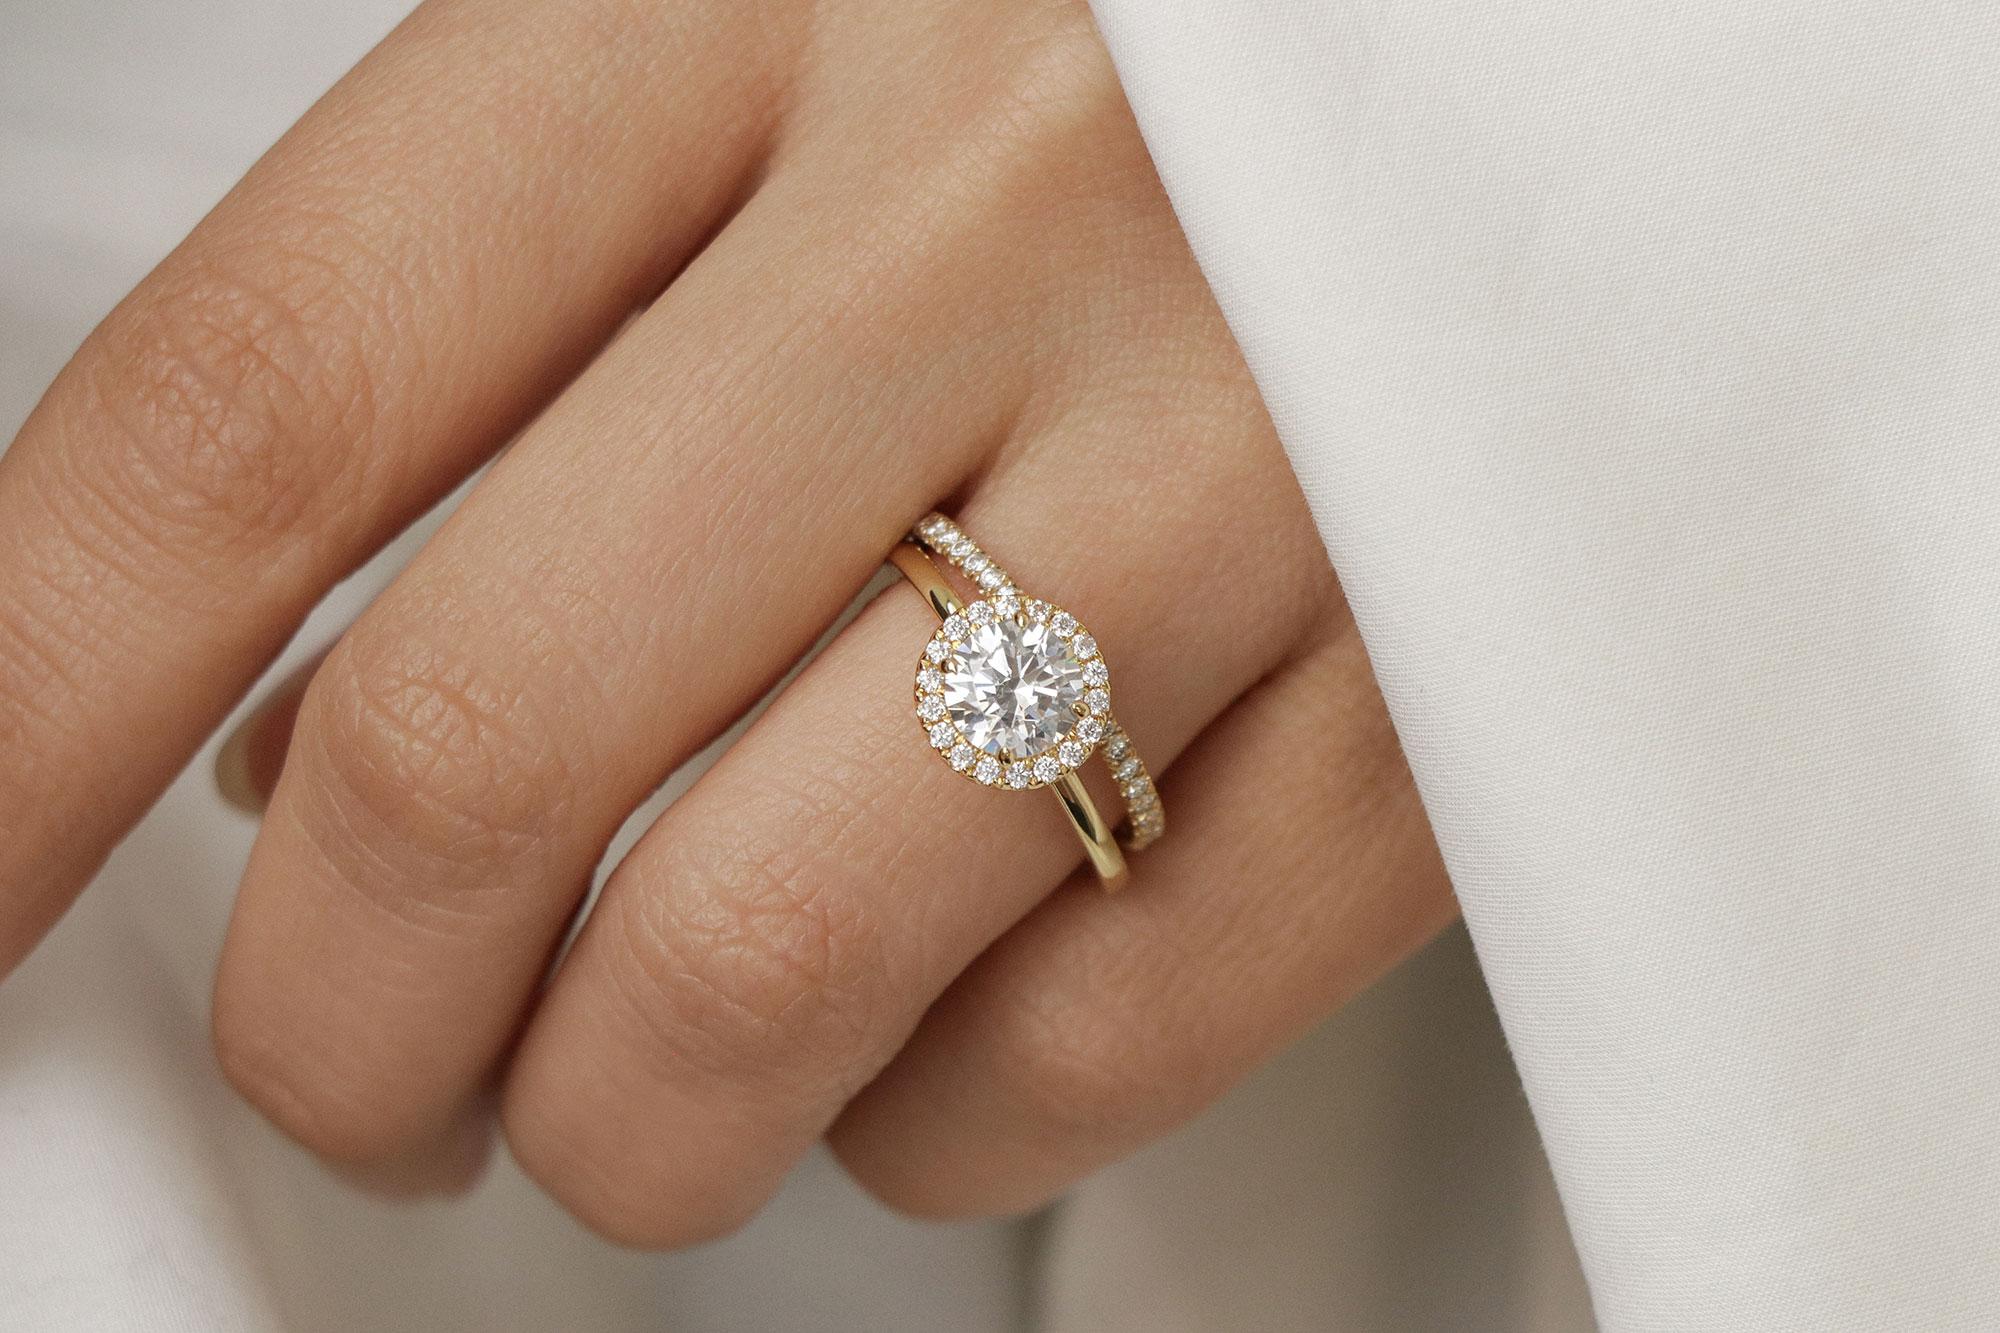 Diamond carat weight & setting